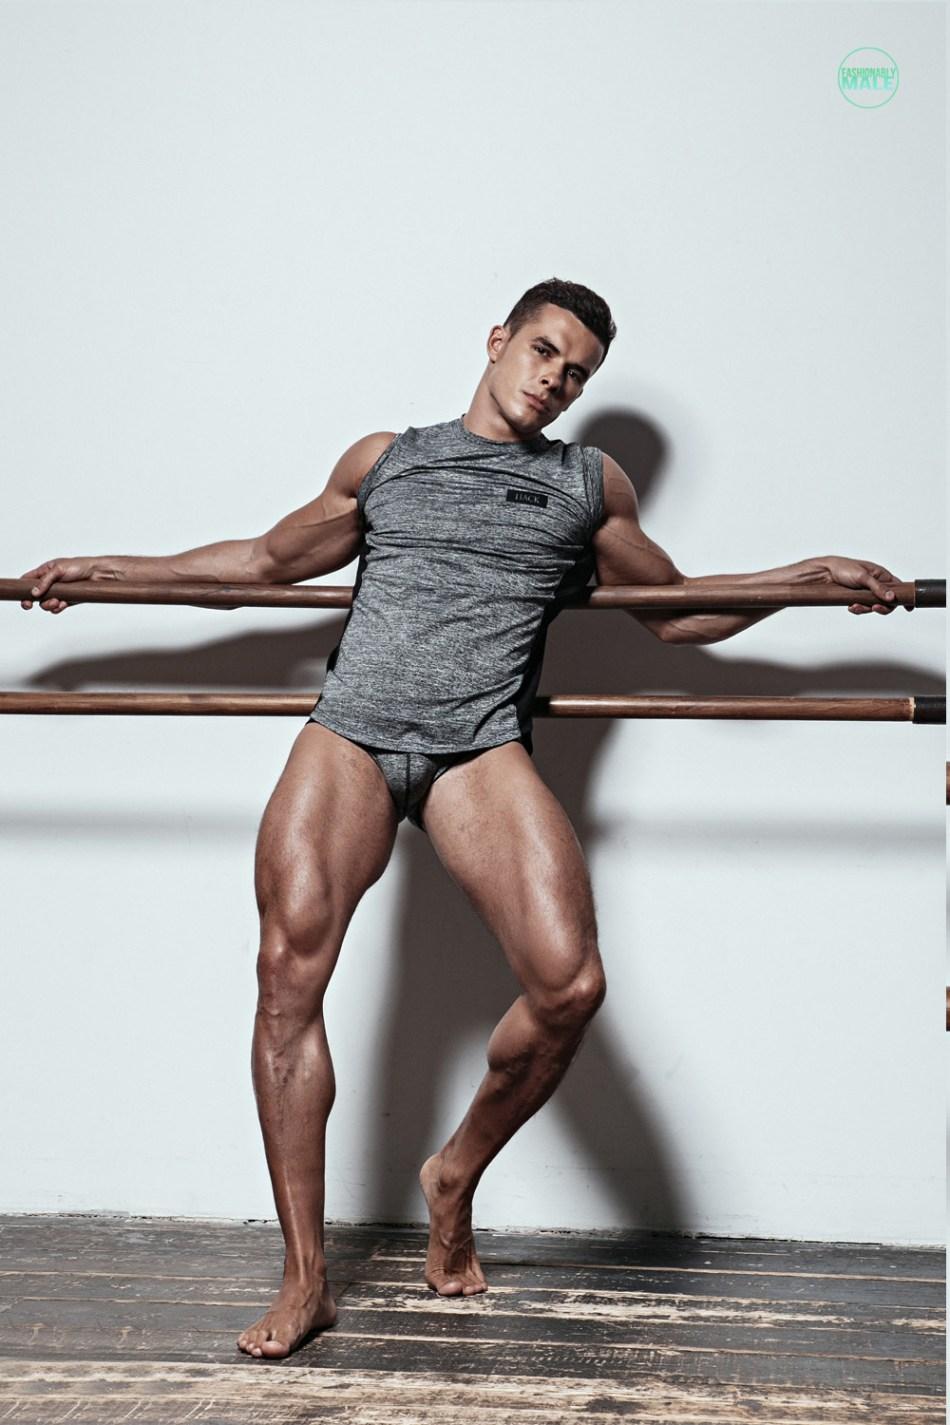 Meet Hottie With A Body Alexander Dorokhov Pics By Pavel